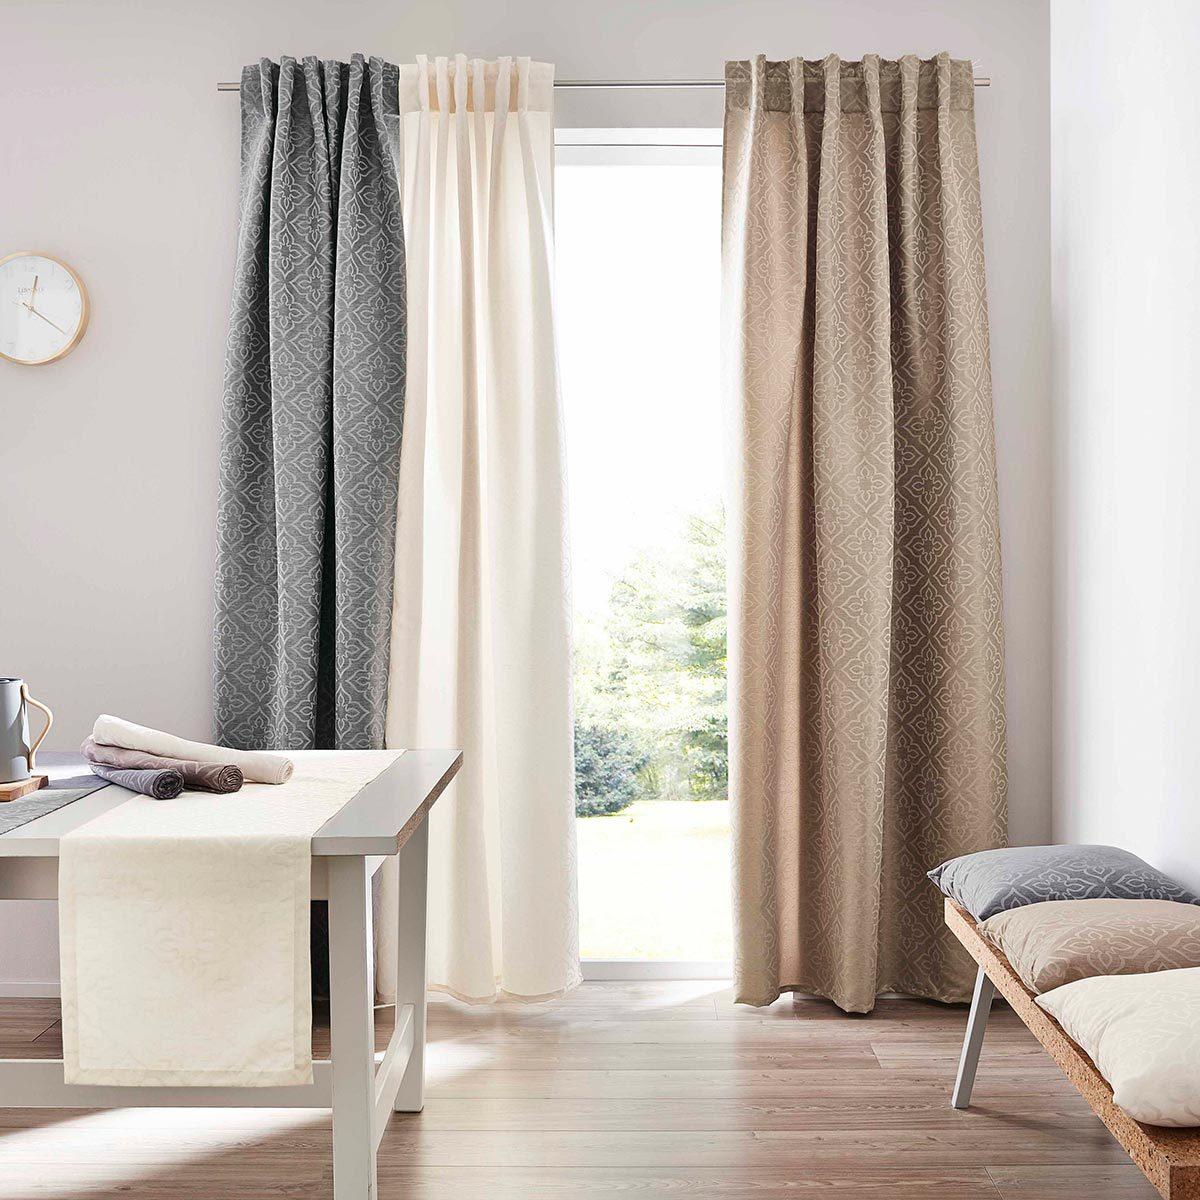 sun garden jacquard kissenh lle palace g nstig online kaufen bei bettwaren shop. Black Bedroom Furniture Sets. Home Design Ideas